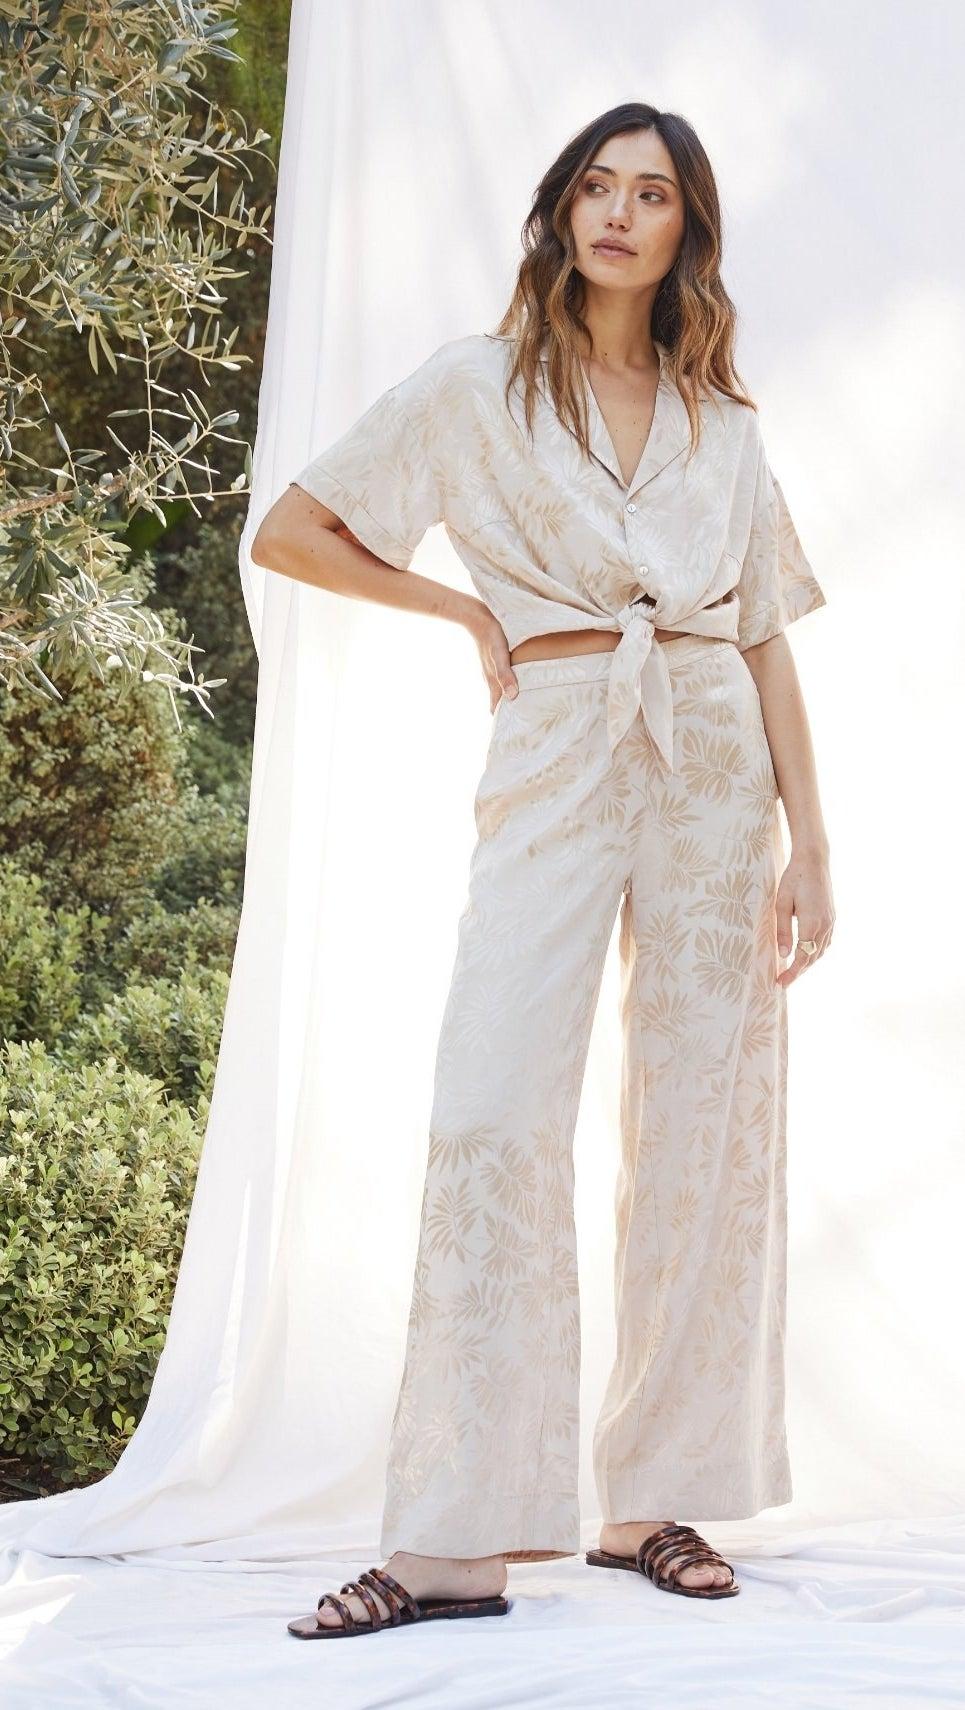 model wearing the leaf-printed cream set